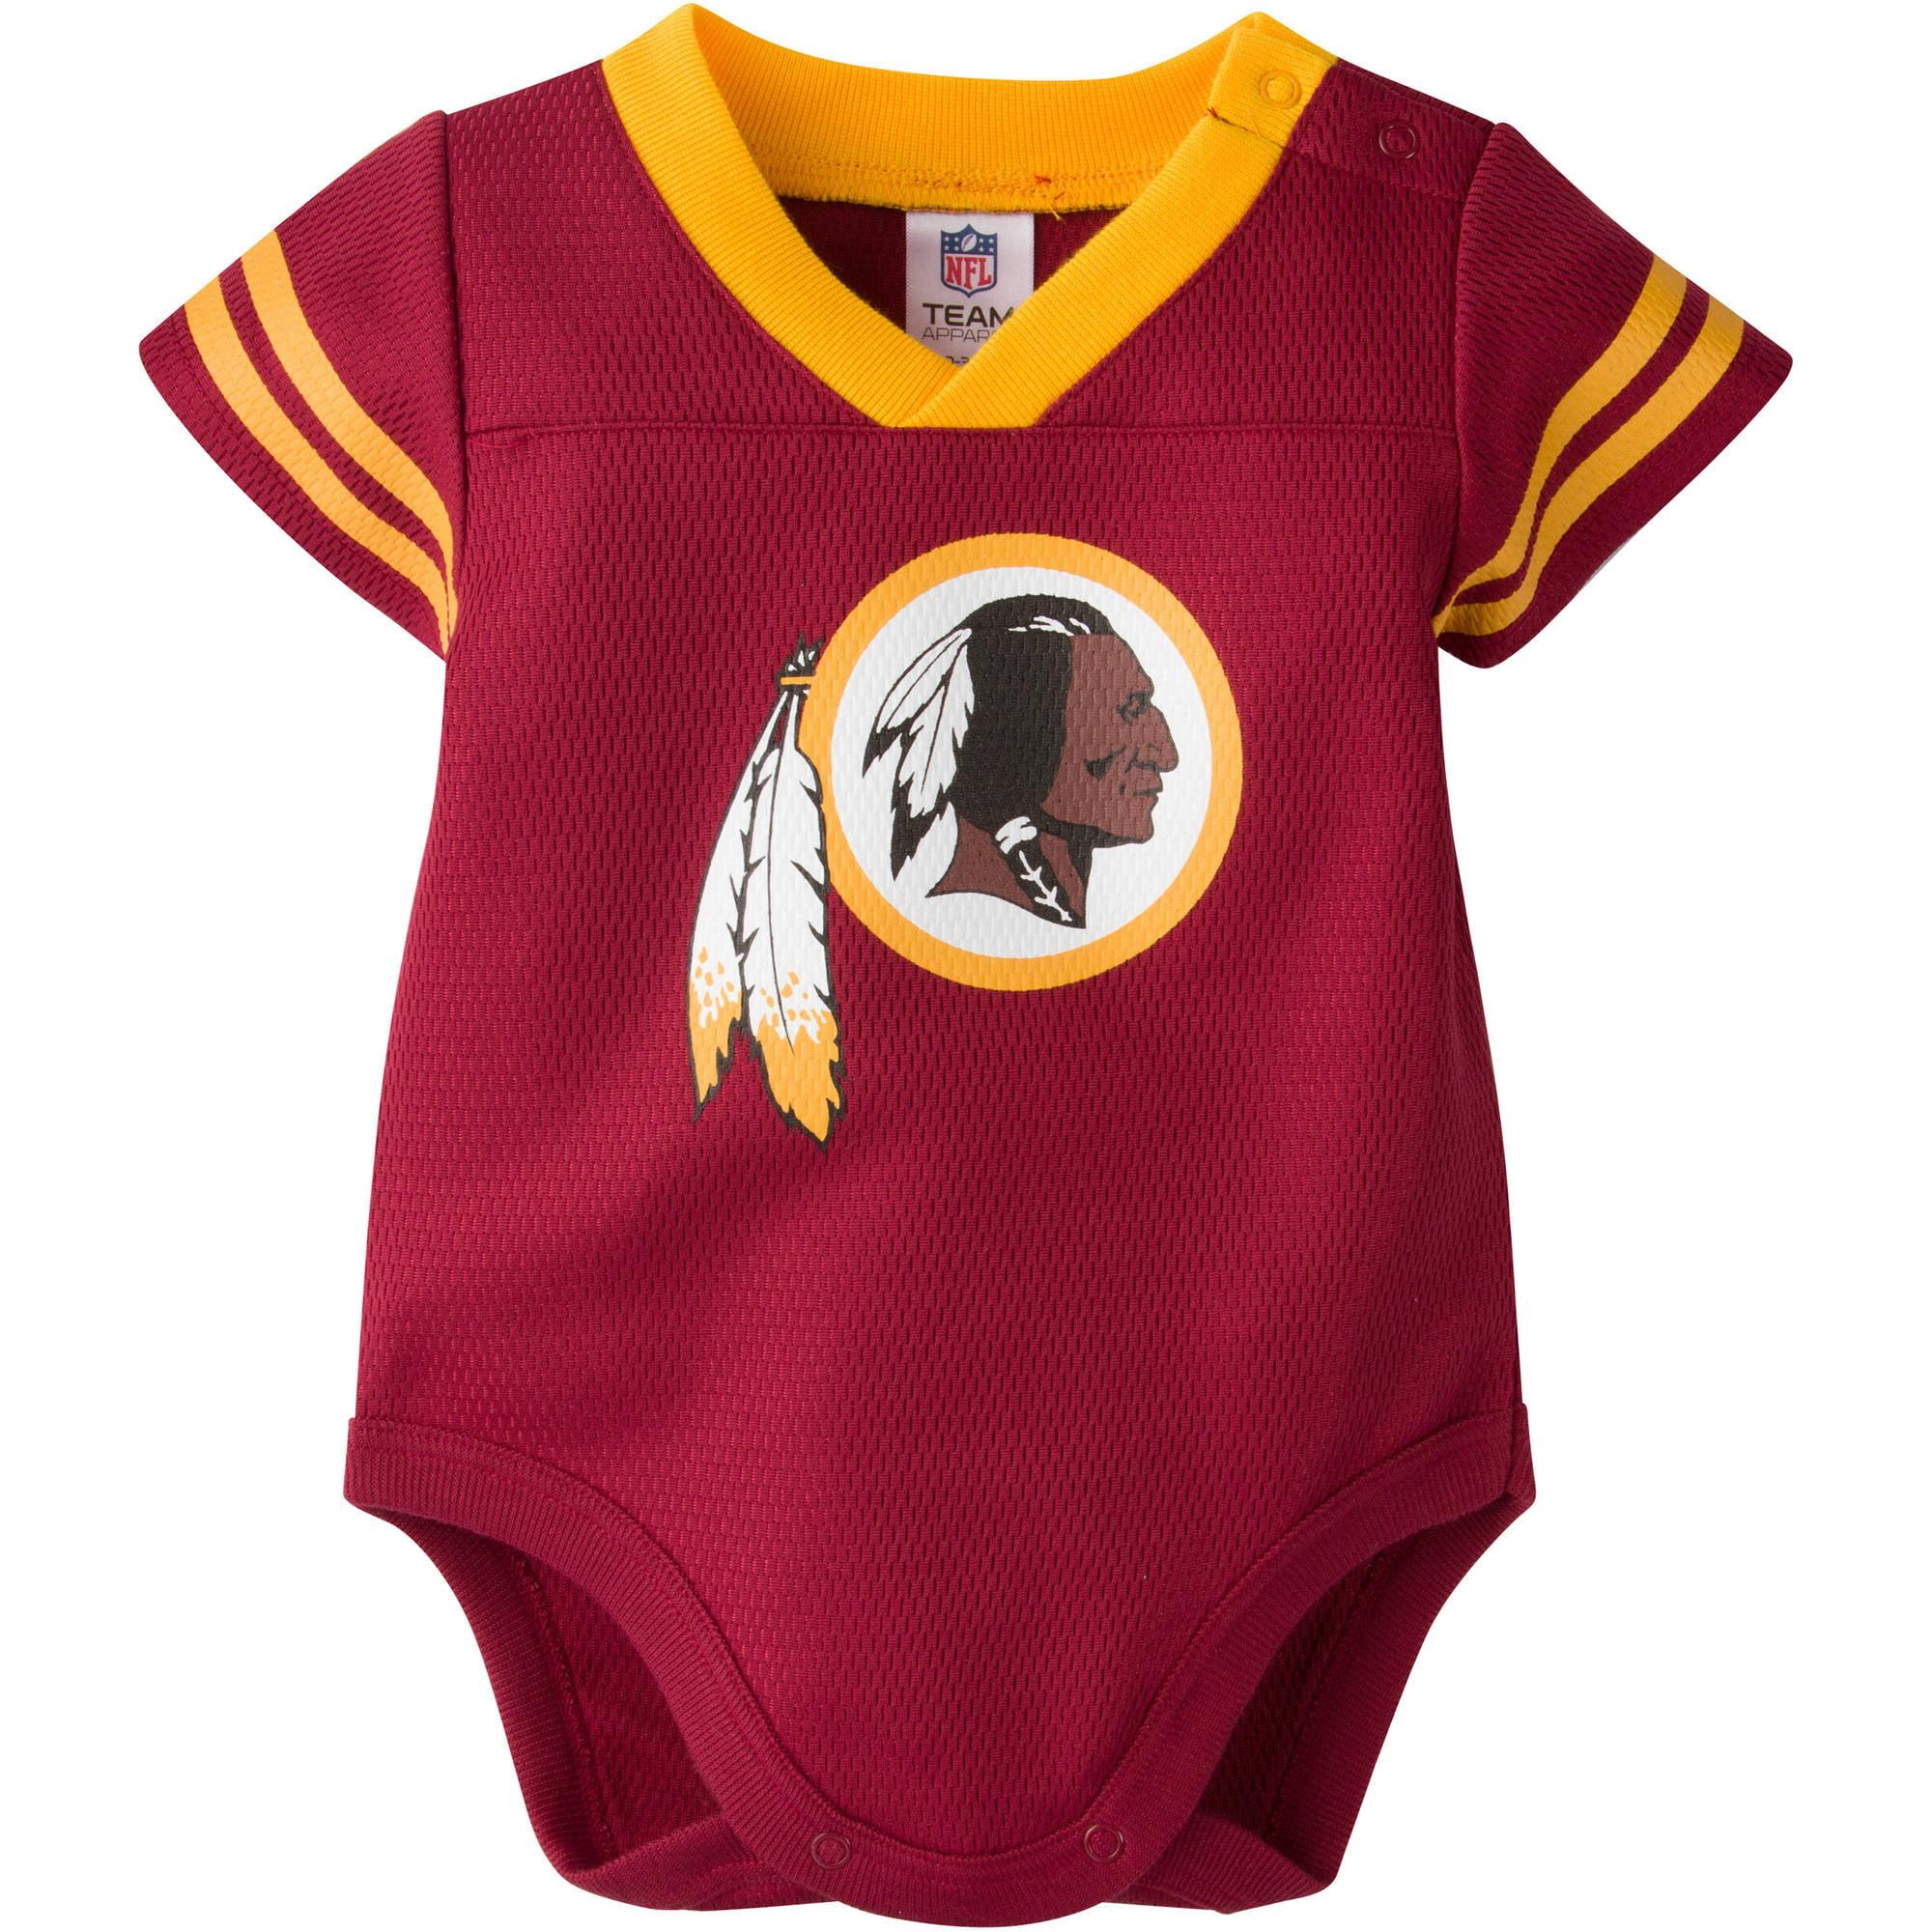 NFL Washington Redskins Baby Boys Mesh Dazzle Bodysuit